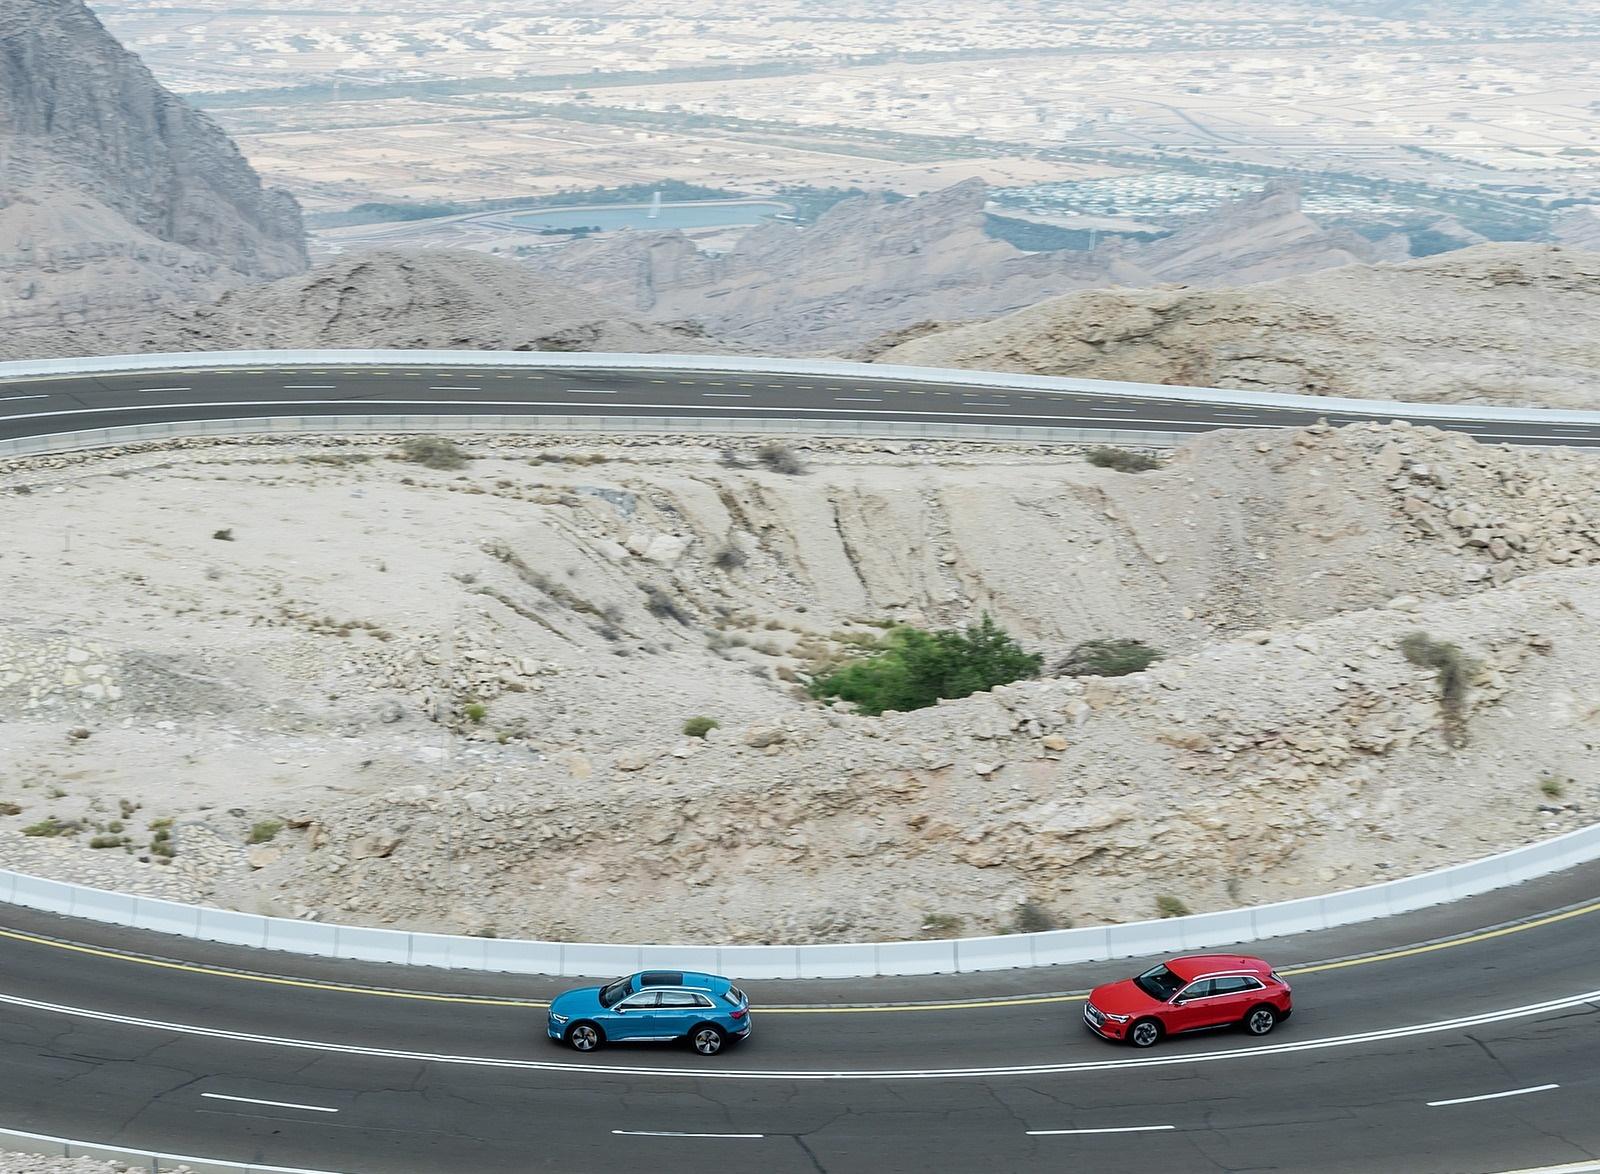 2019 Audi e-tron (Color: Antigua Blue) and Audi e-tron (Color: Catalunya Red) Side Wallpapers (2)